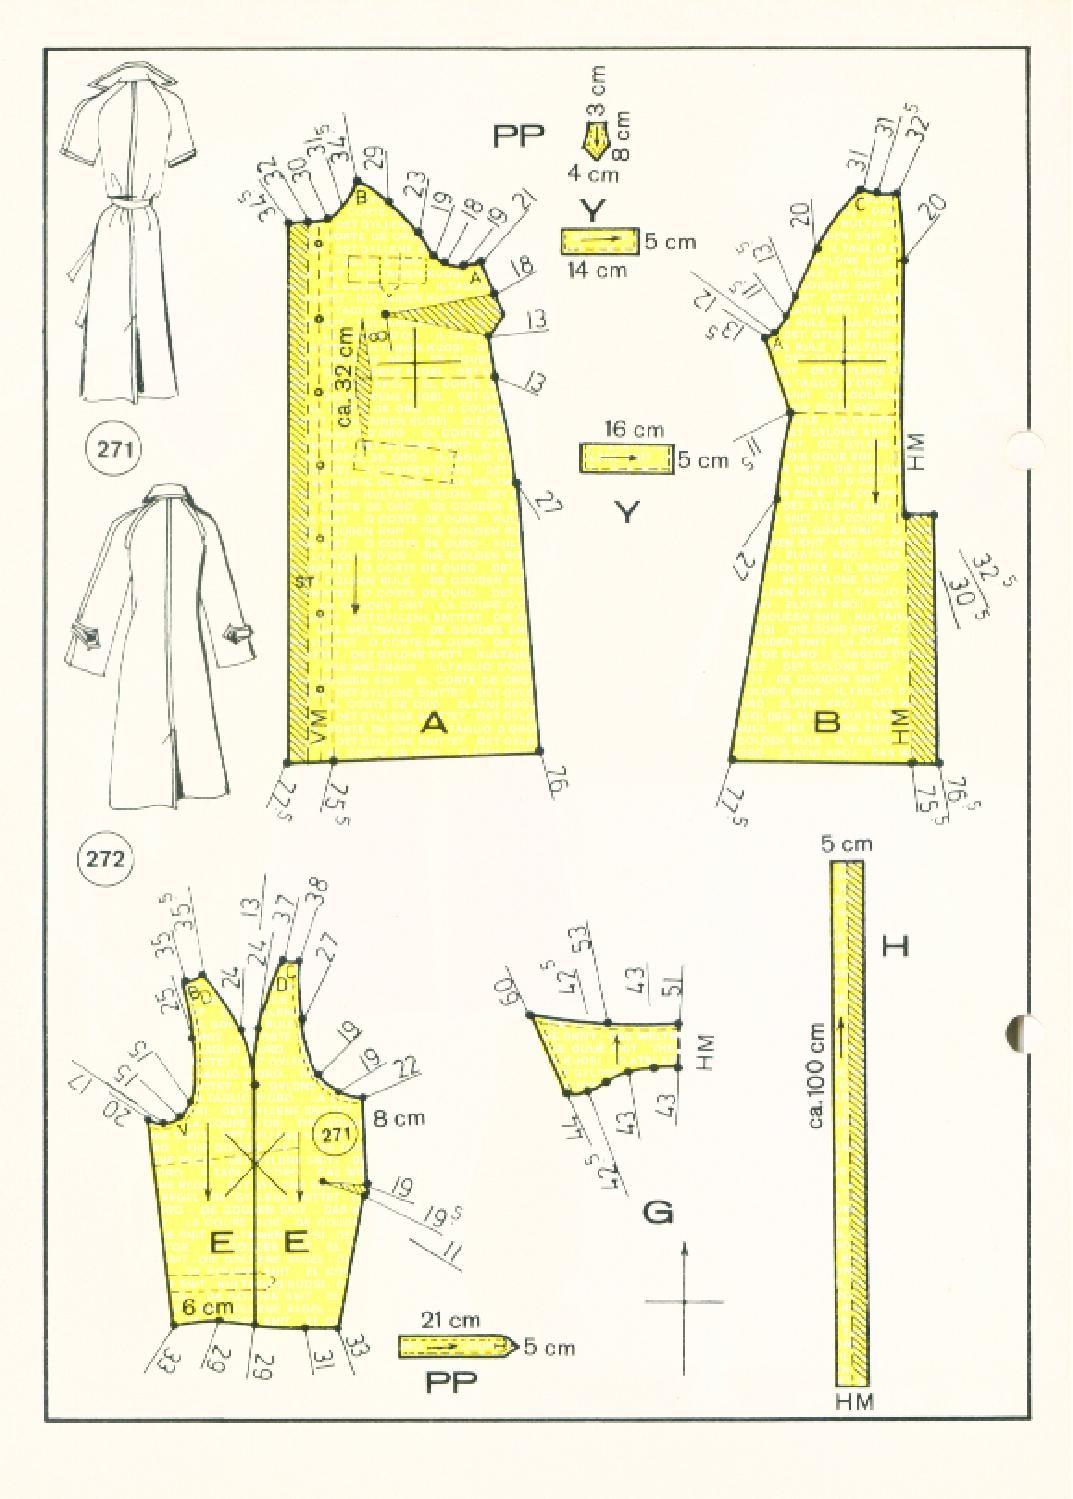 Vintage Sewing Patterns 146 autumn 1977 Patternmaking | corte de oro ...